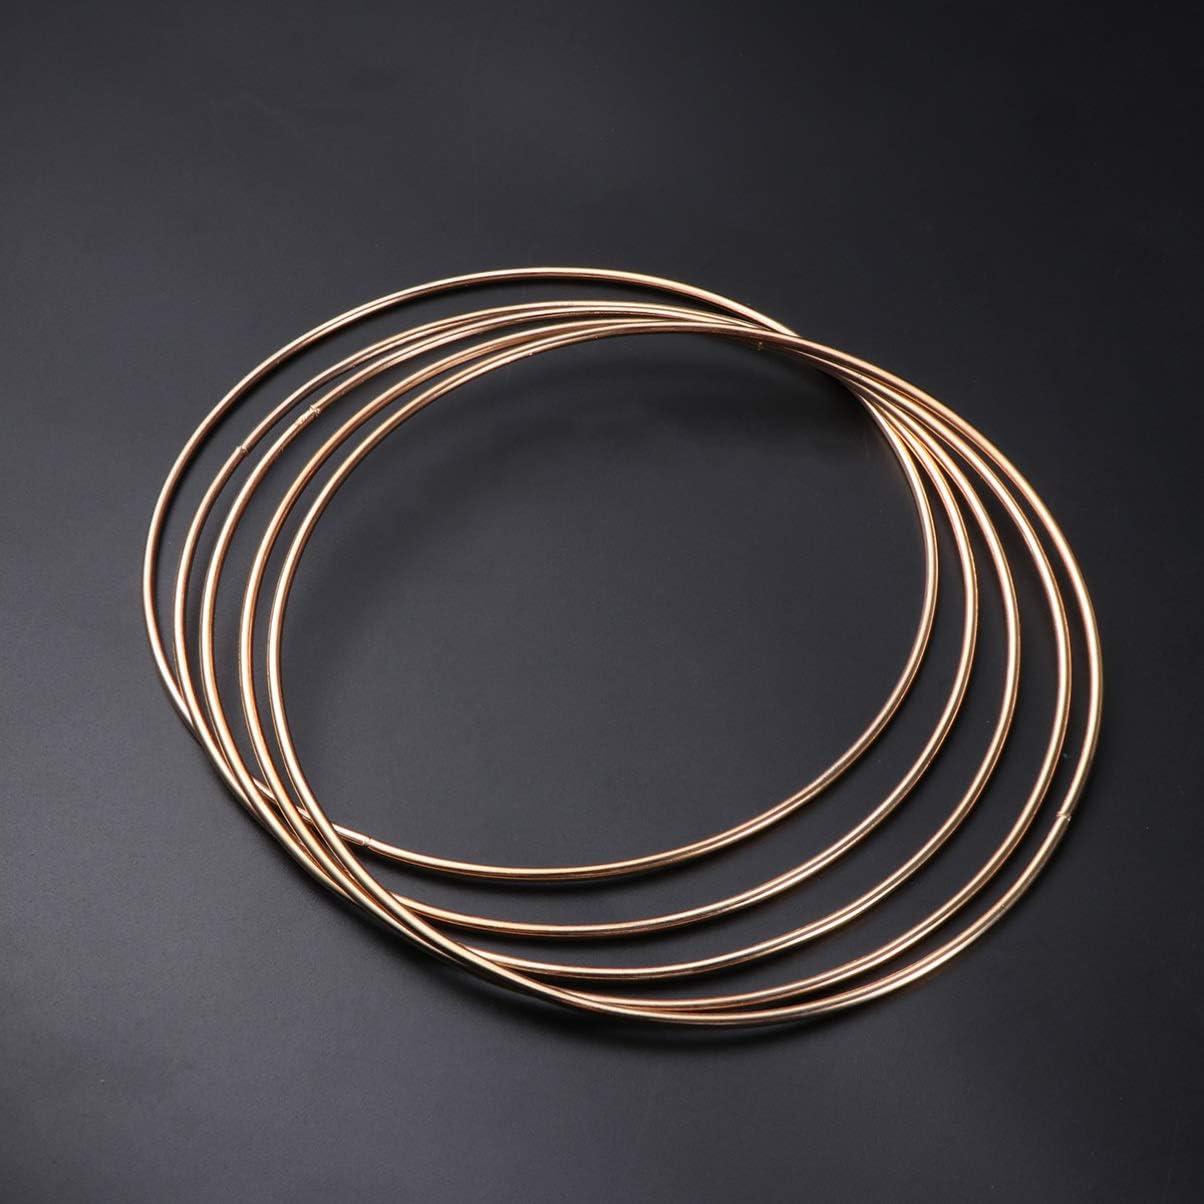 LIOOBO 5 Pcs Metal Smooth Golden Dreamcatcher Hoop Ring for Spirit Shields Plant Hangers Dream Catchers Macrame Creations